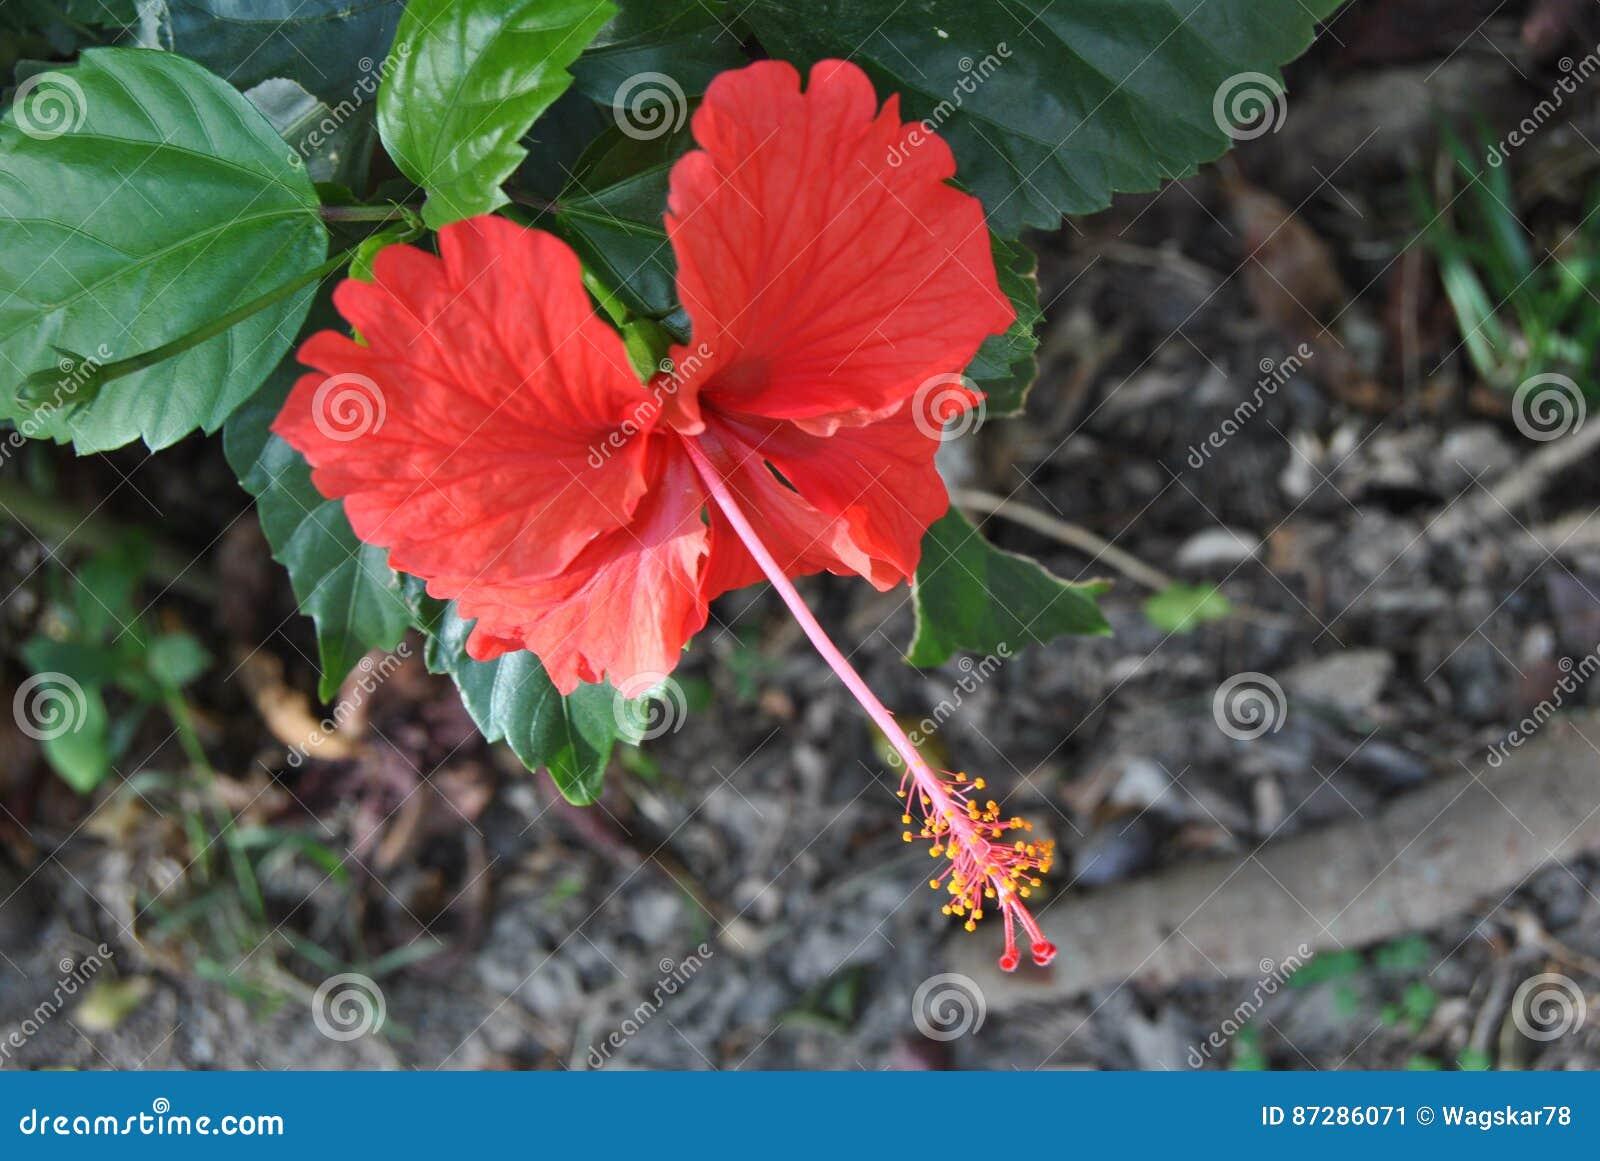 Hibisco rojo